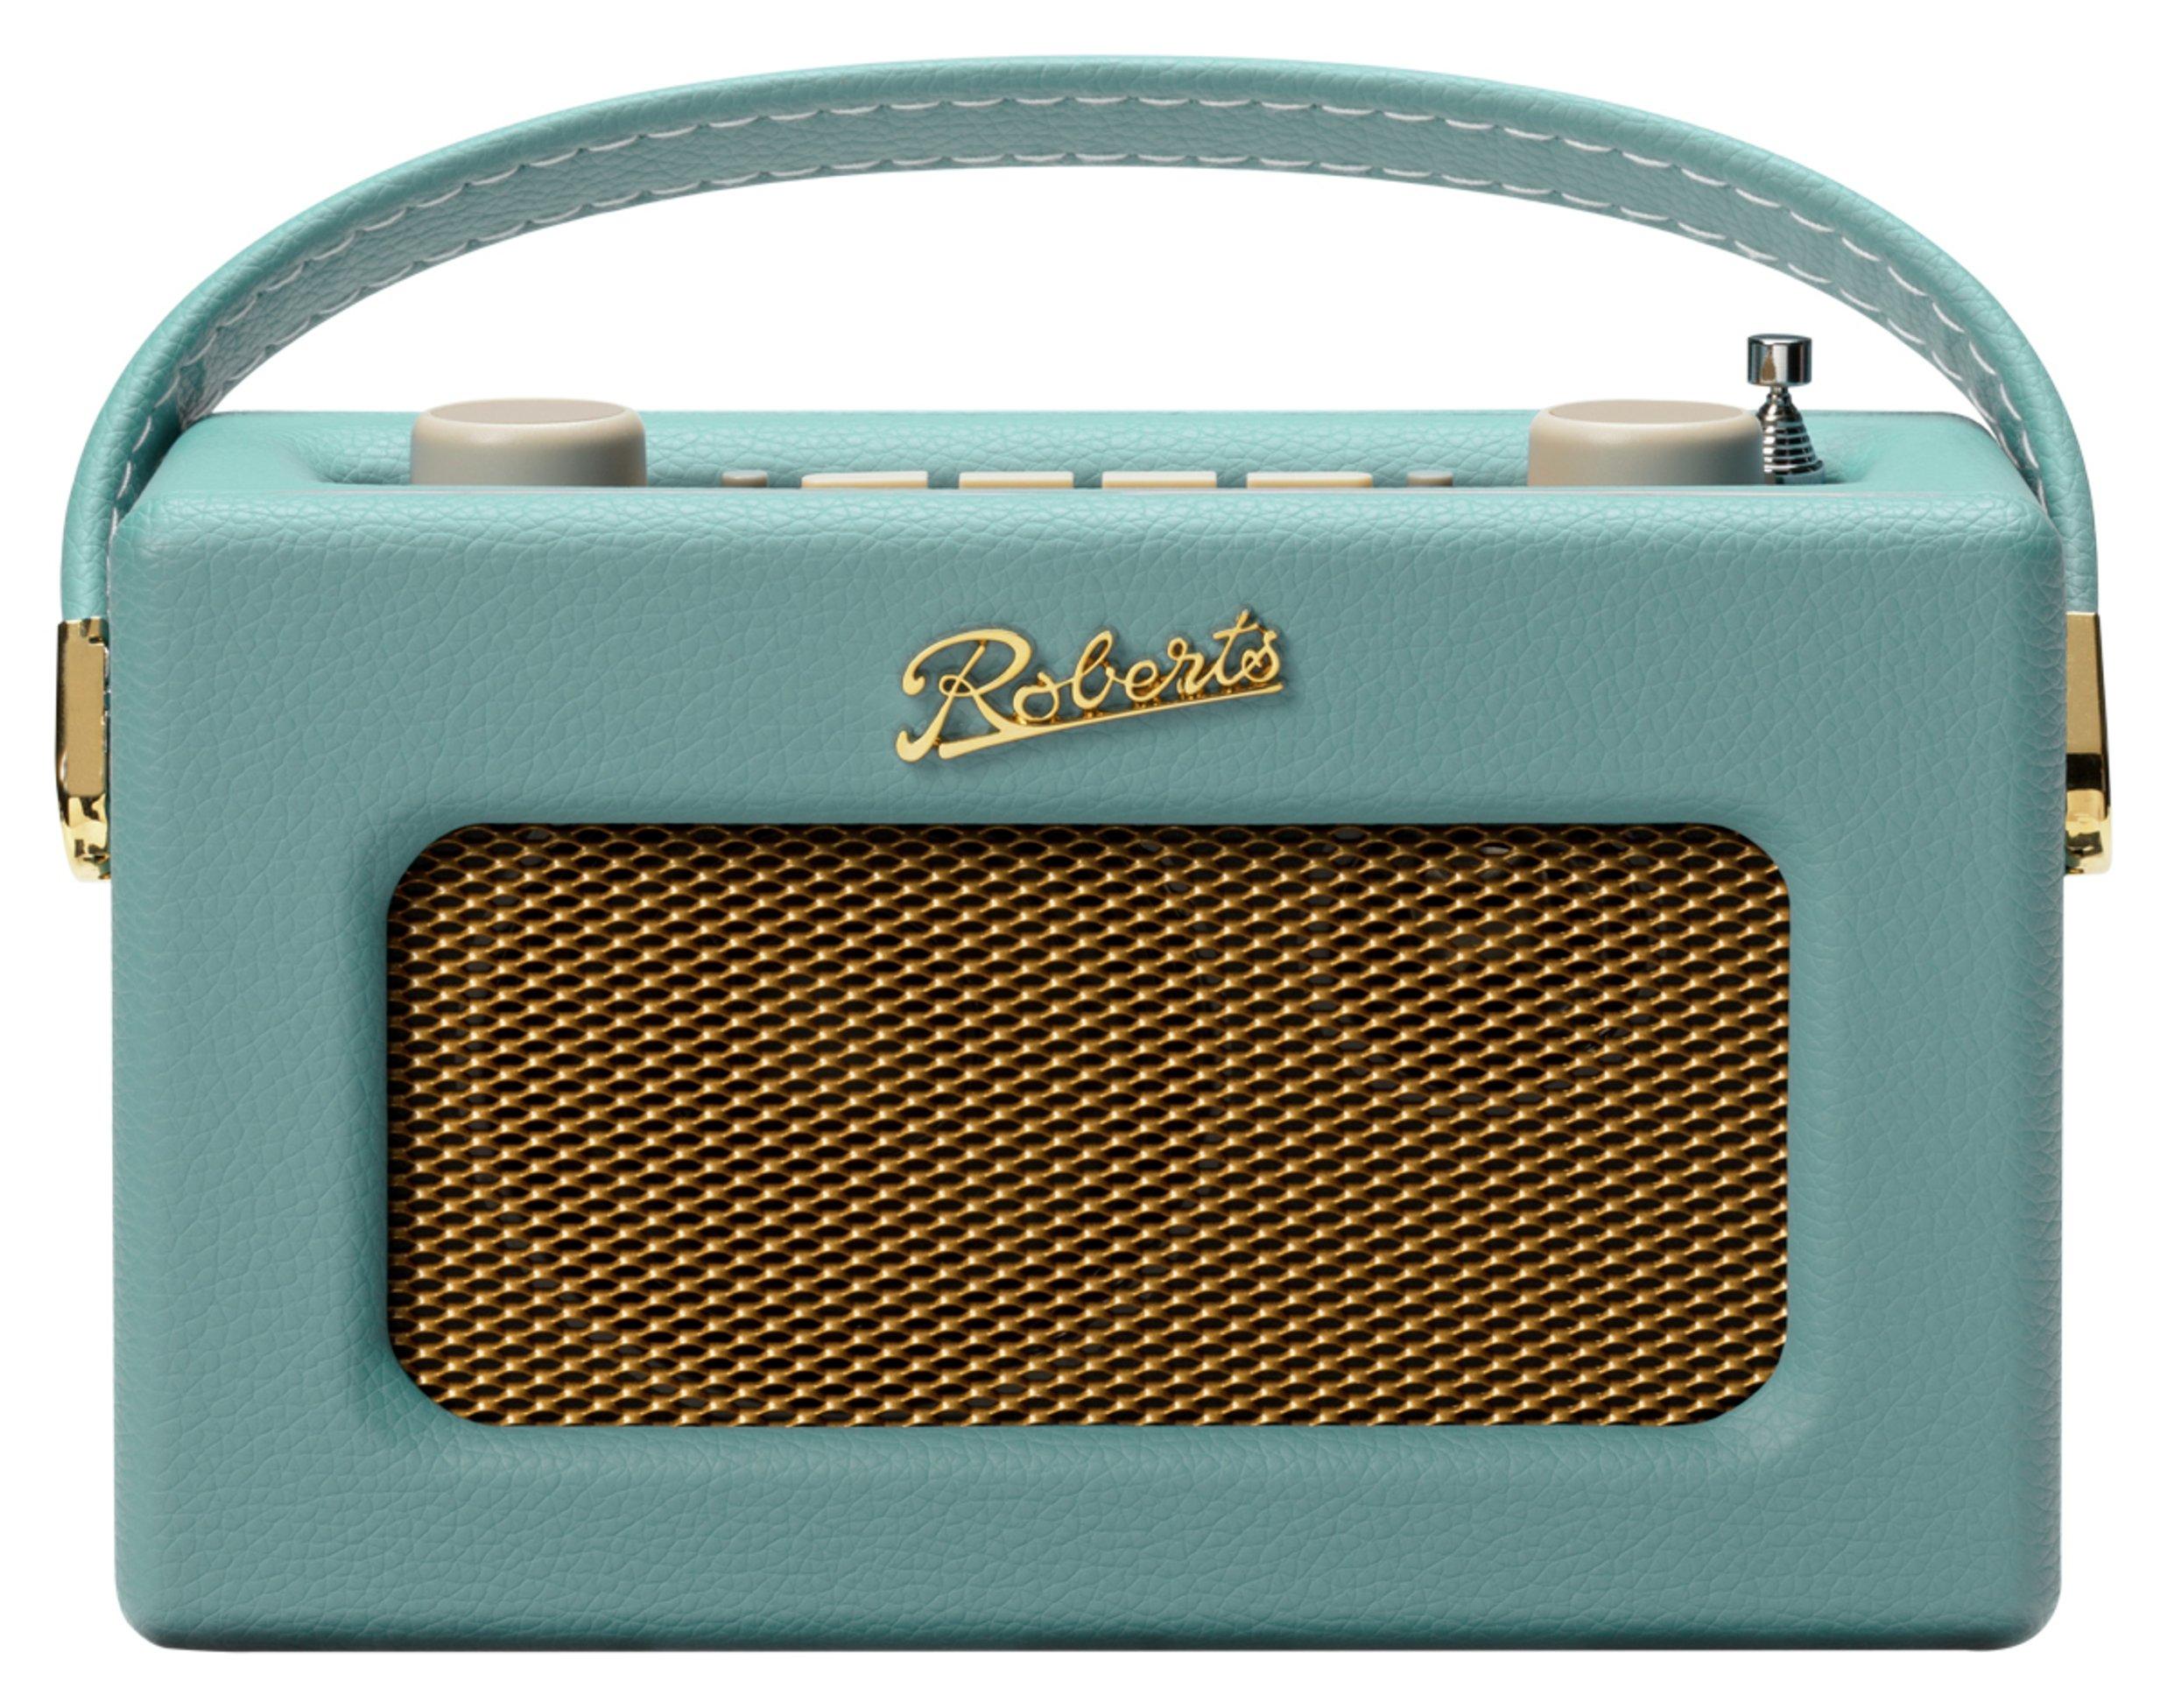 Roberts Revival Uno DAB / DAB+ / FM Radio - Duck Egg